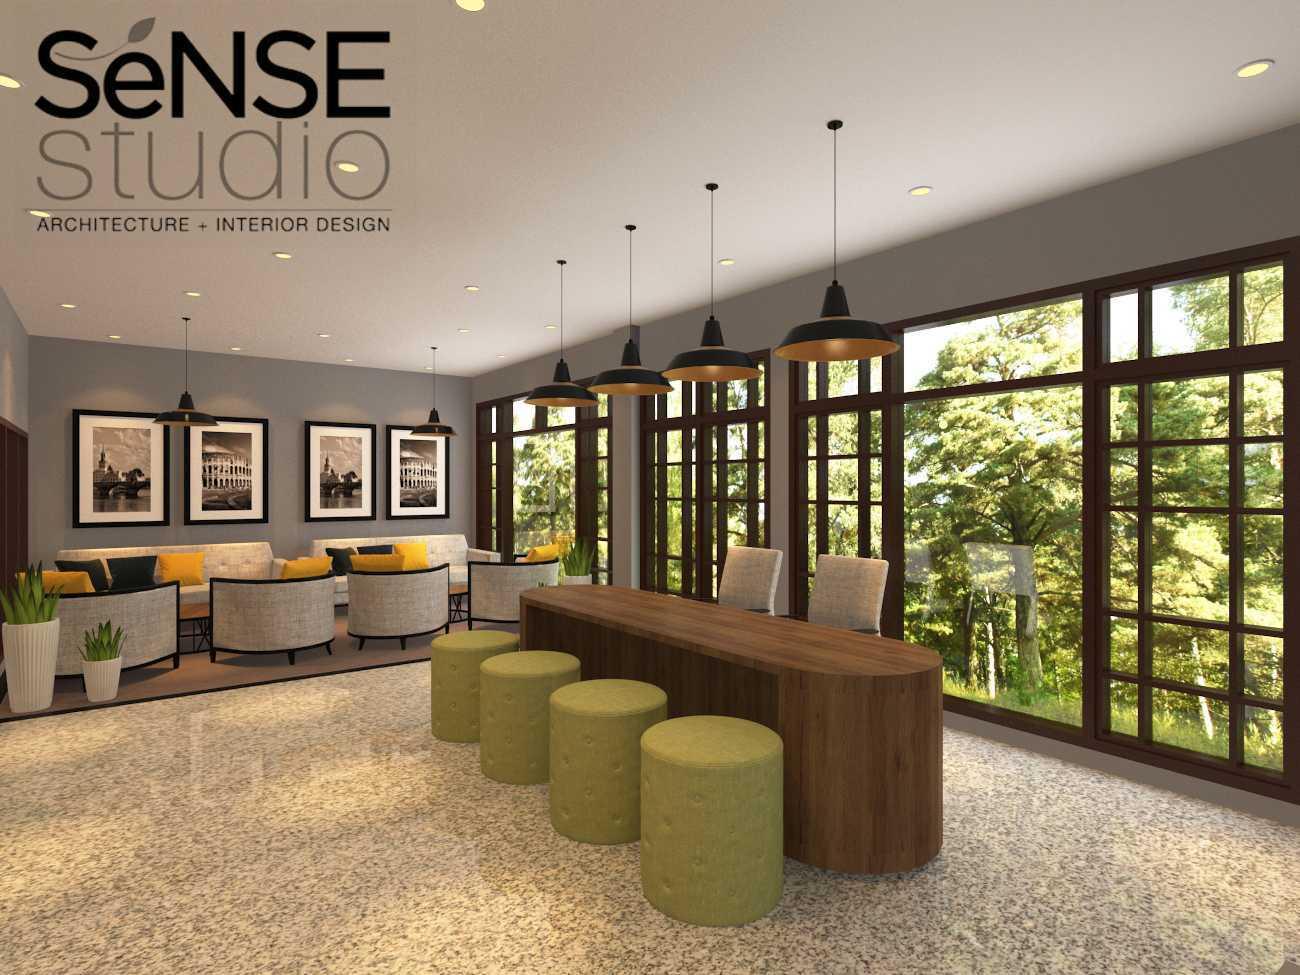 Sense Isle Studio Office Surabaya Surabaya, Kota Sby, Jawa Timur, Indonesia Surabaya, Kota Sby, Jawa Timur, Indonesia Sense-Studio-Office-Surabaya   80419